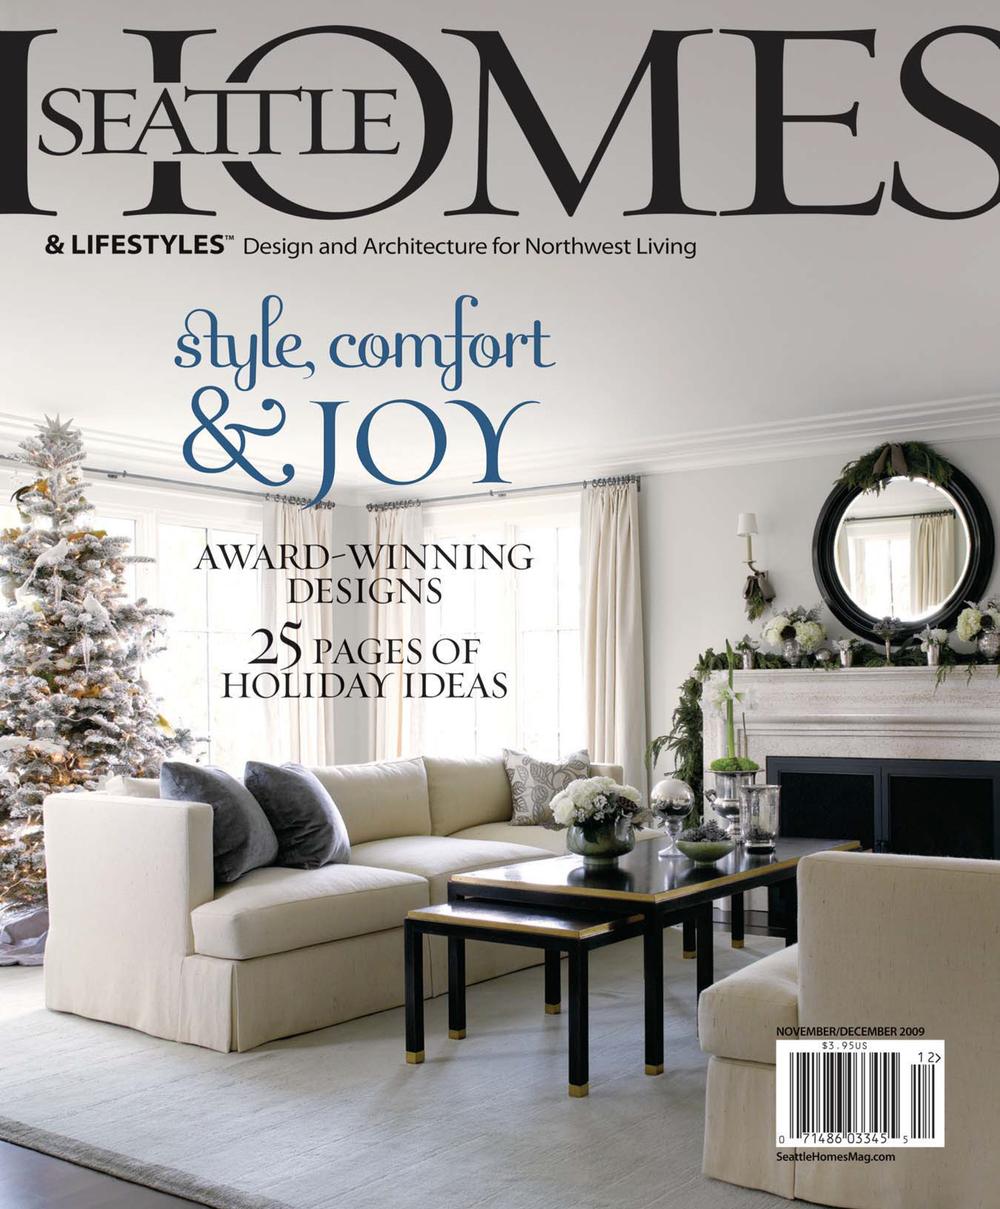 Seattle-Homes-Christmas-2009-1.jpg